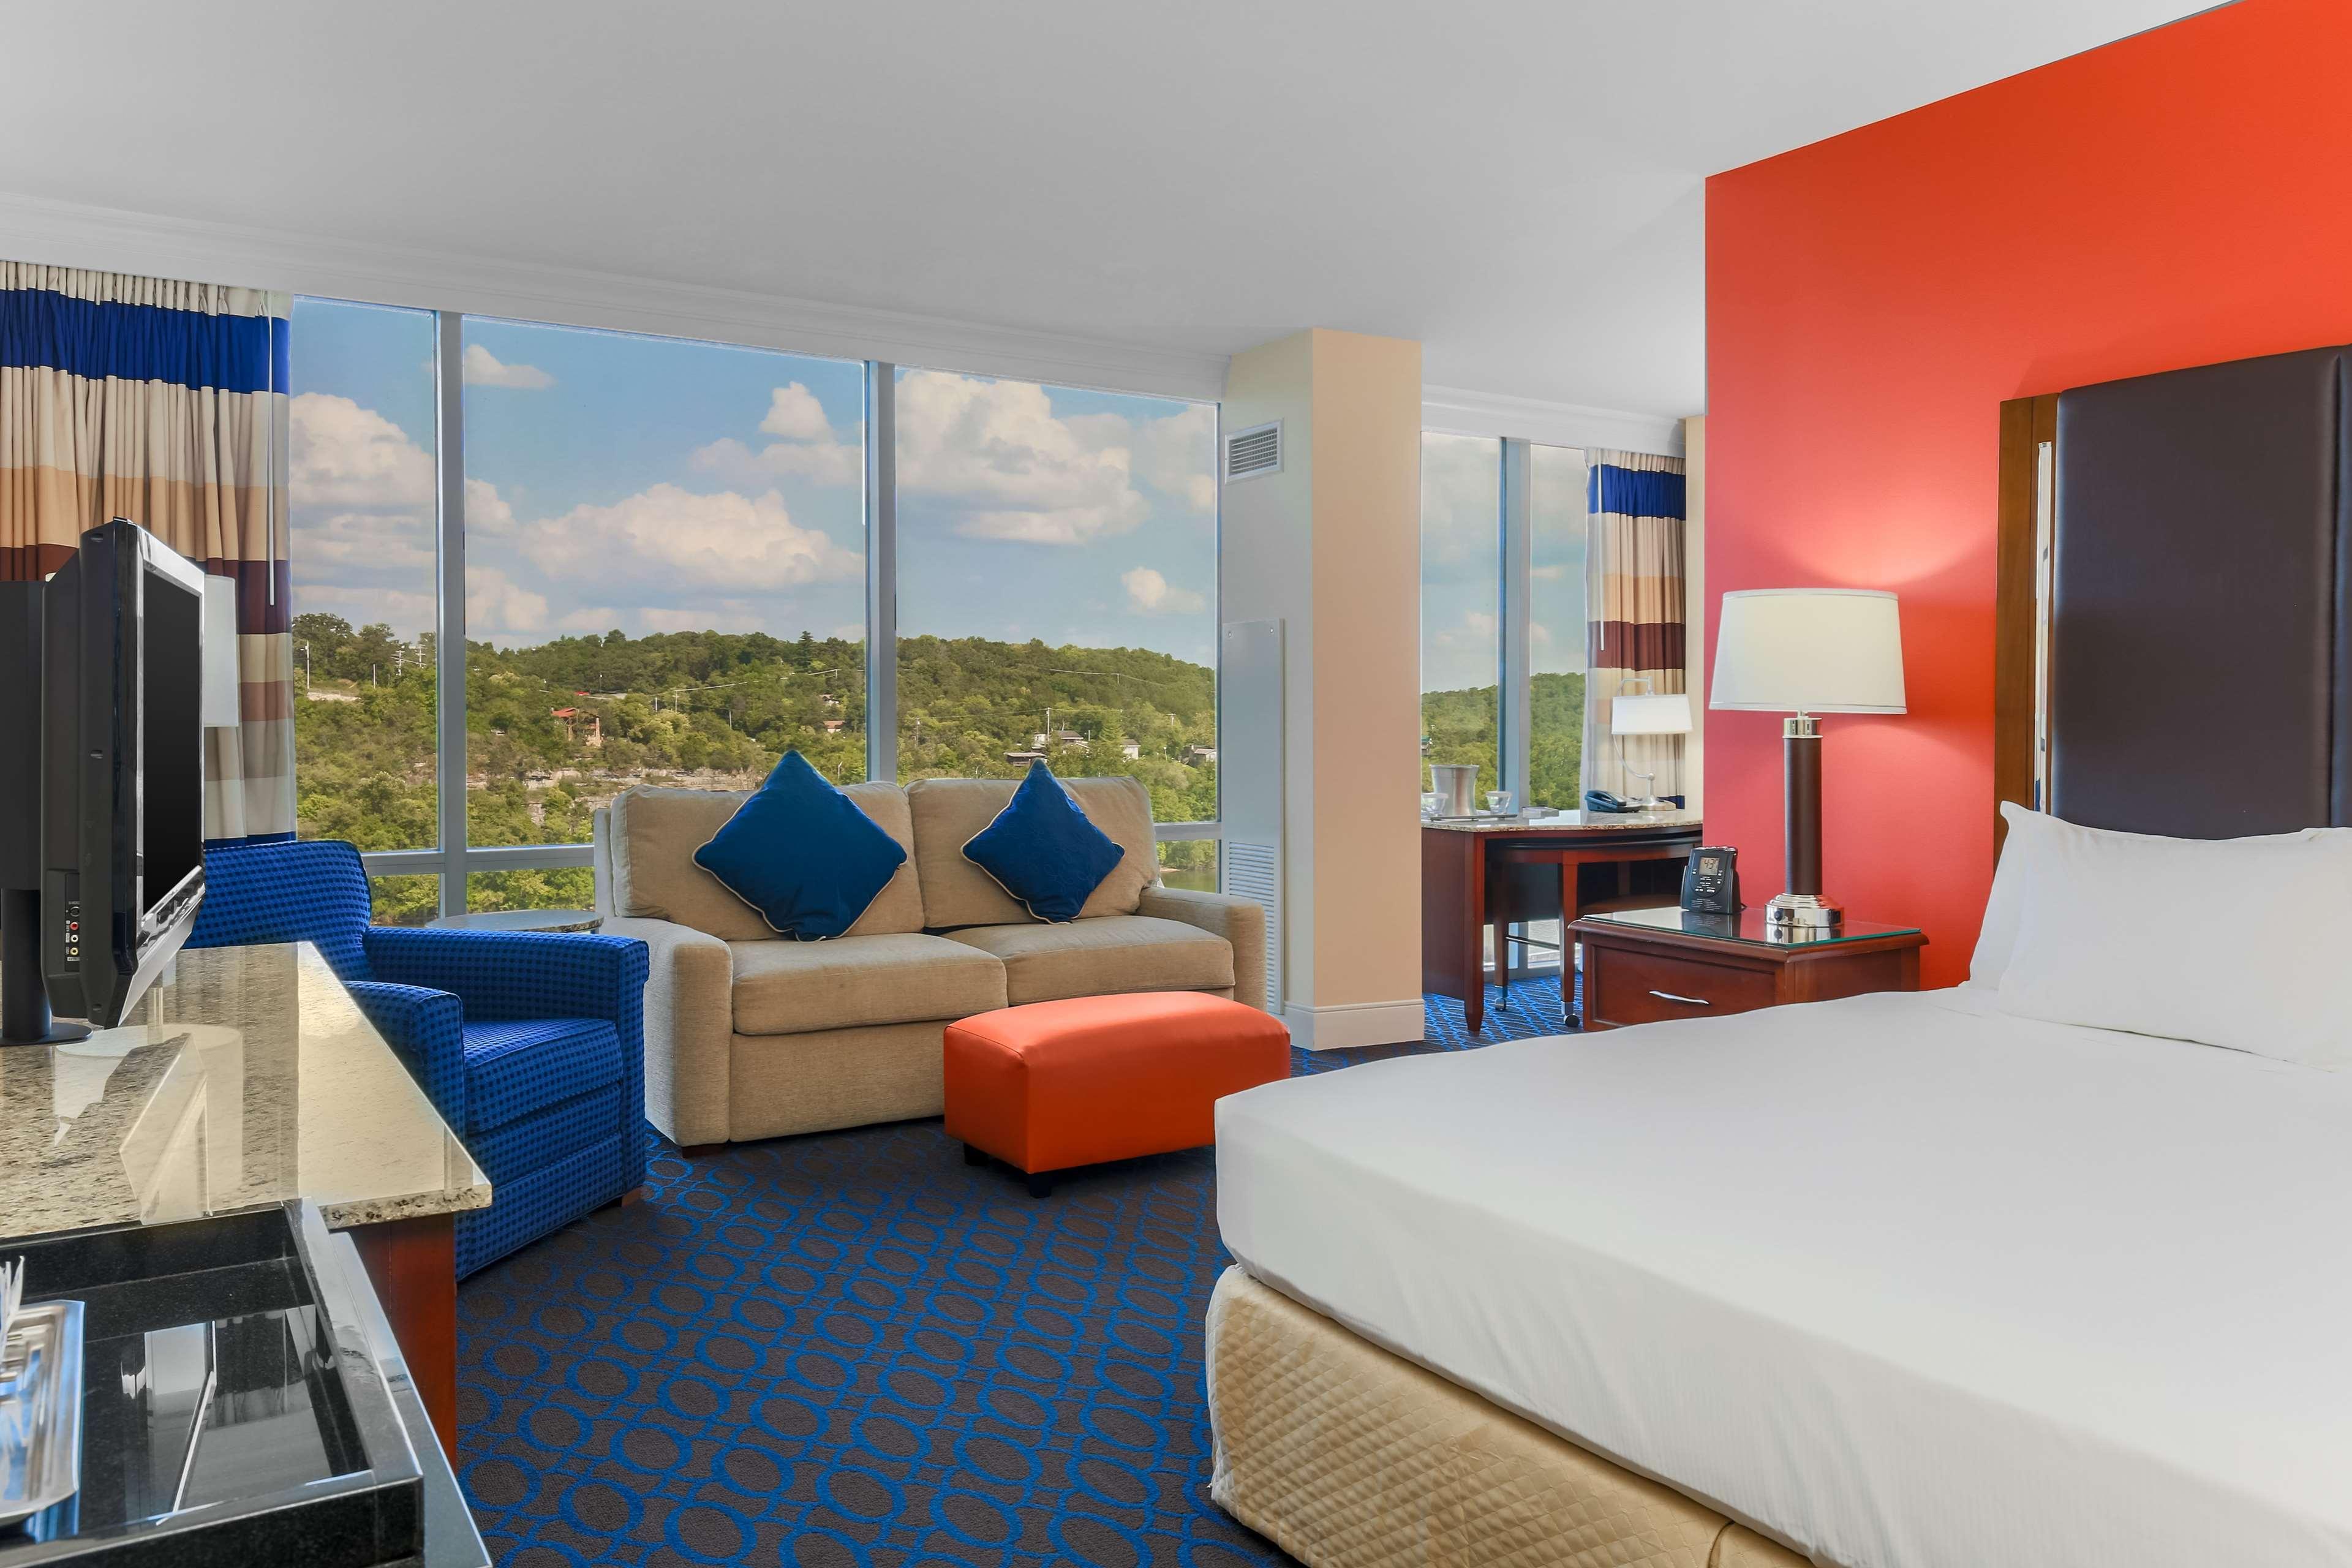 Hilton Branson Convention Center image 13